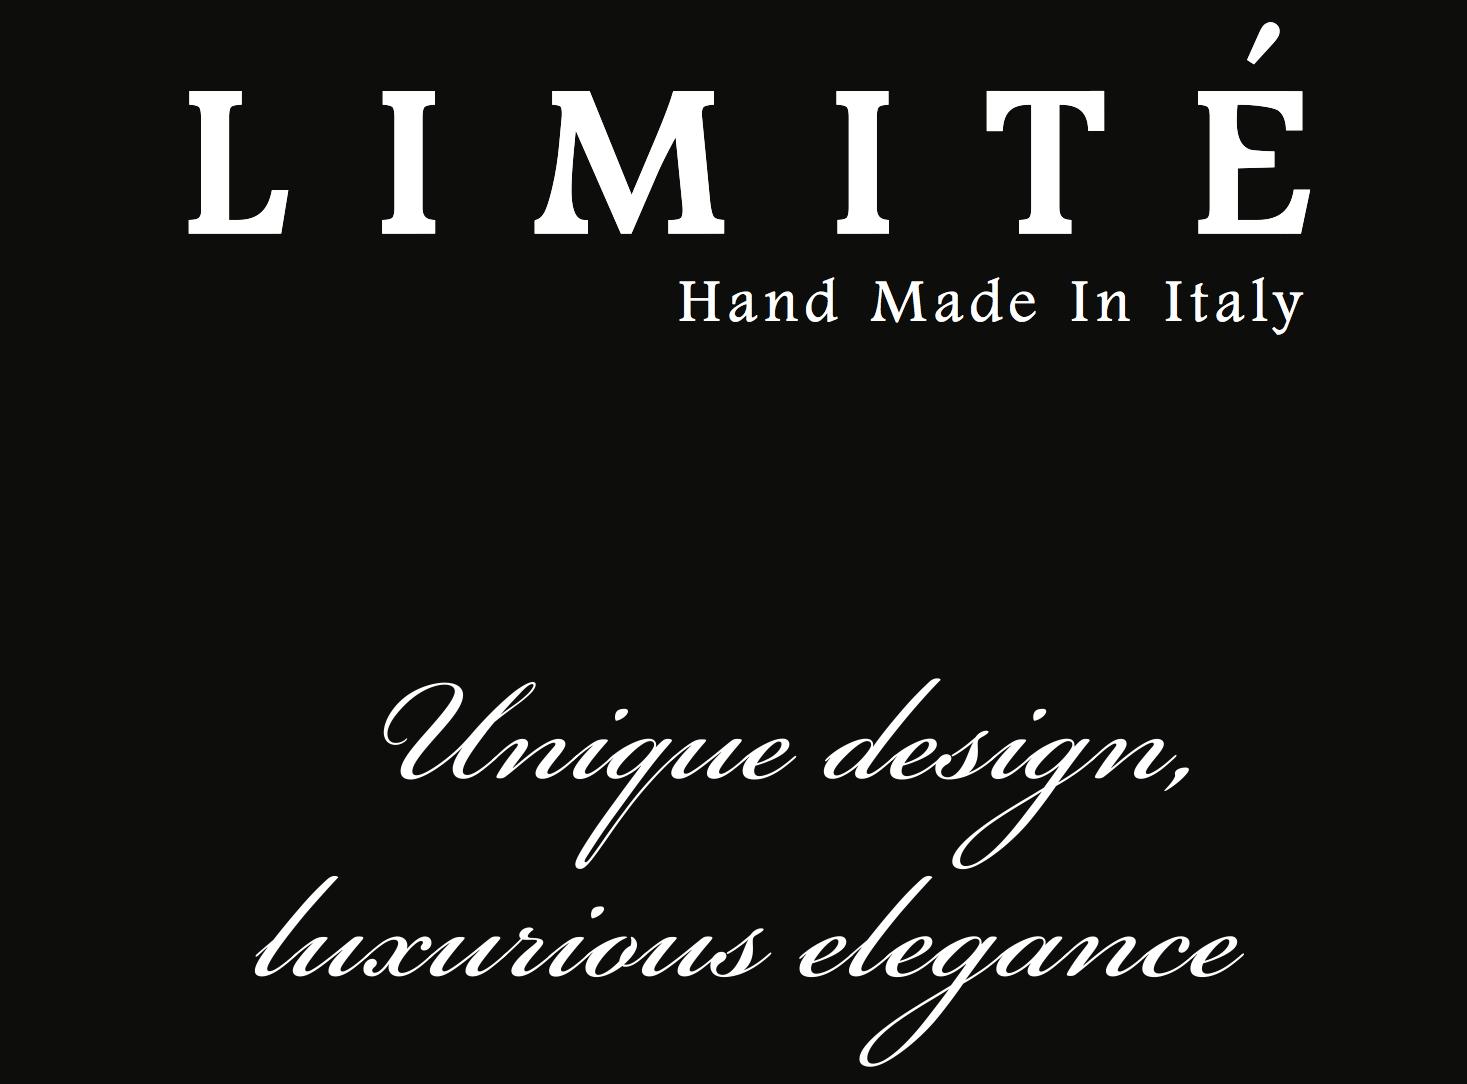 limite_master2 2 (dragged) copy.jpg